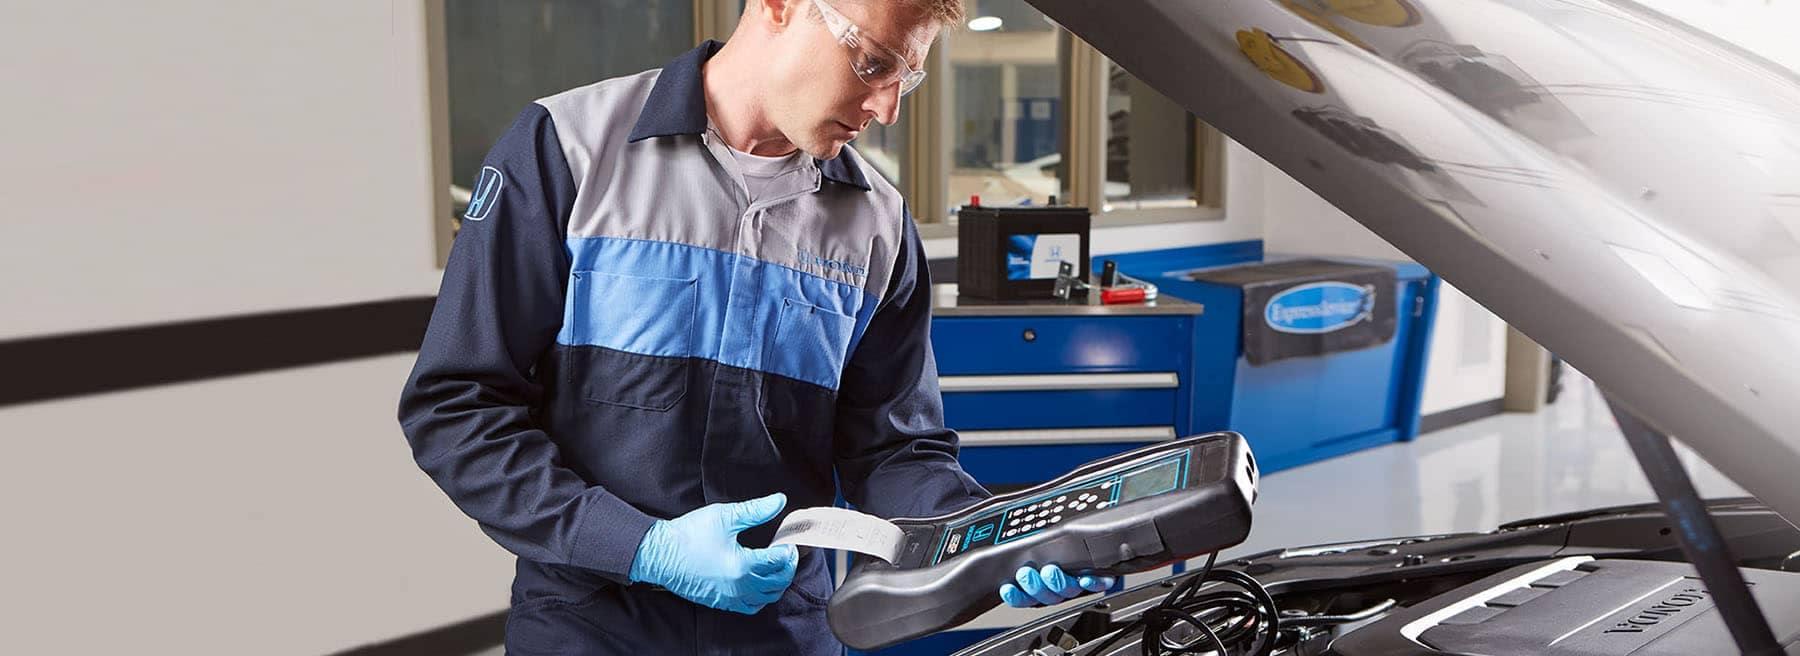 Honda Technician Working